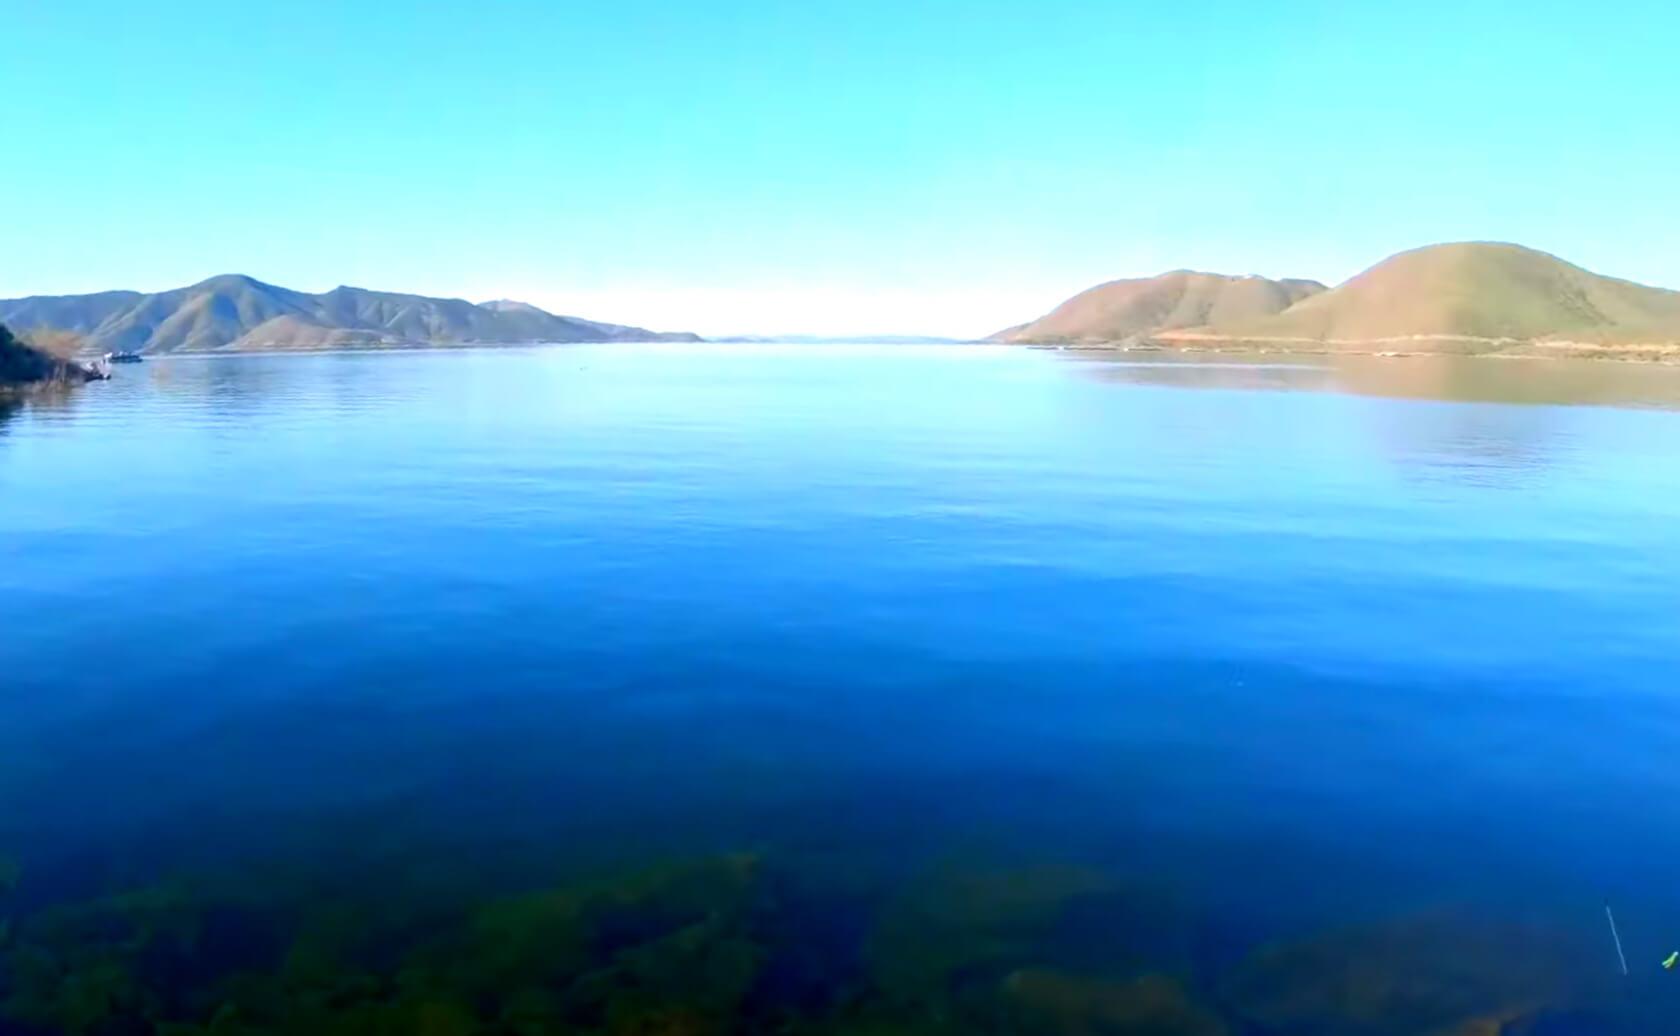 Diamond-Valley-Lake-Fishing-Guide-Report-Hemet-CA-12